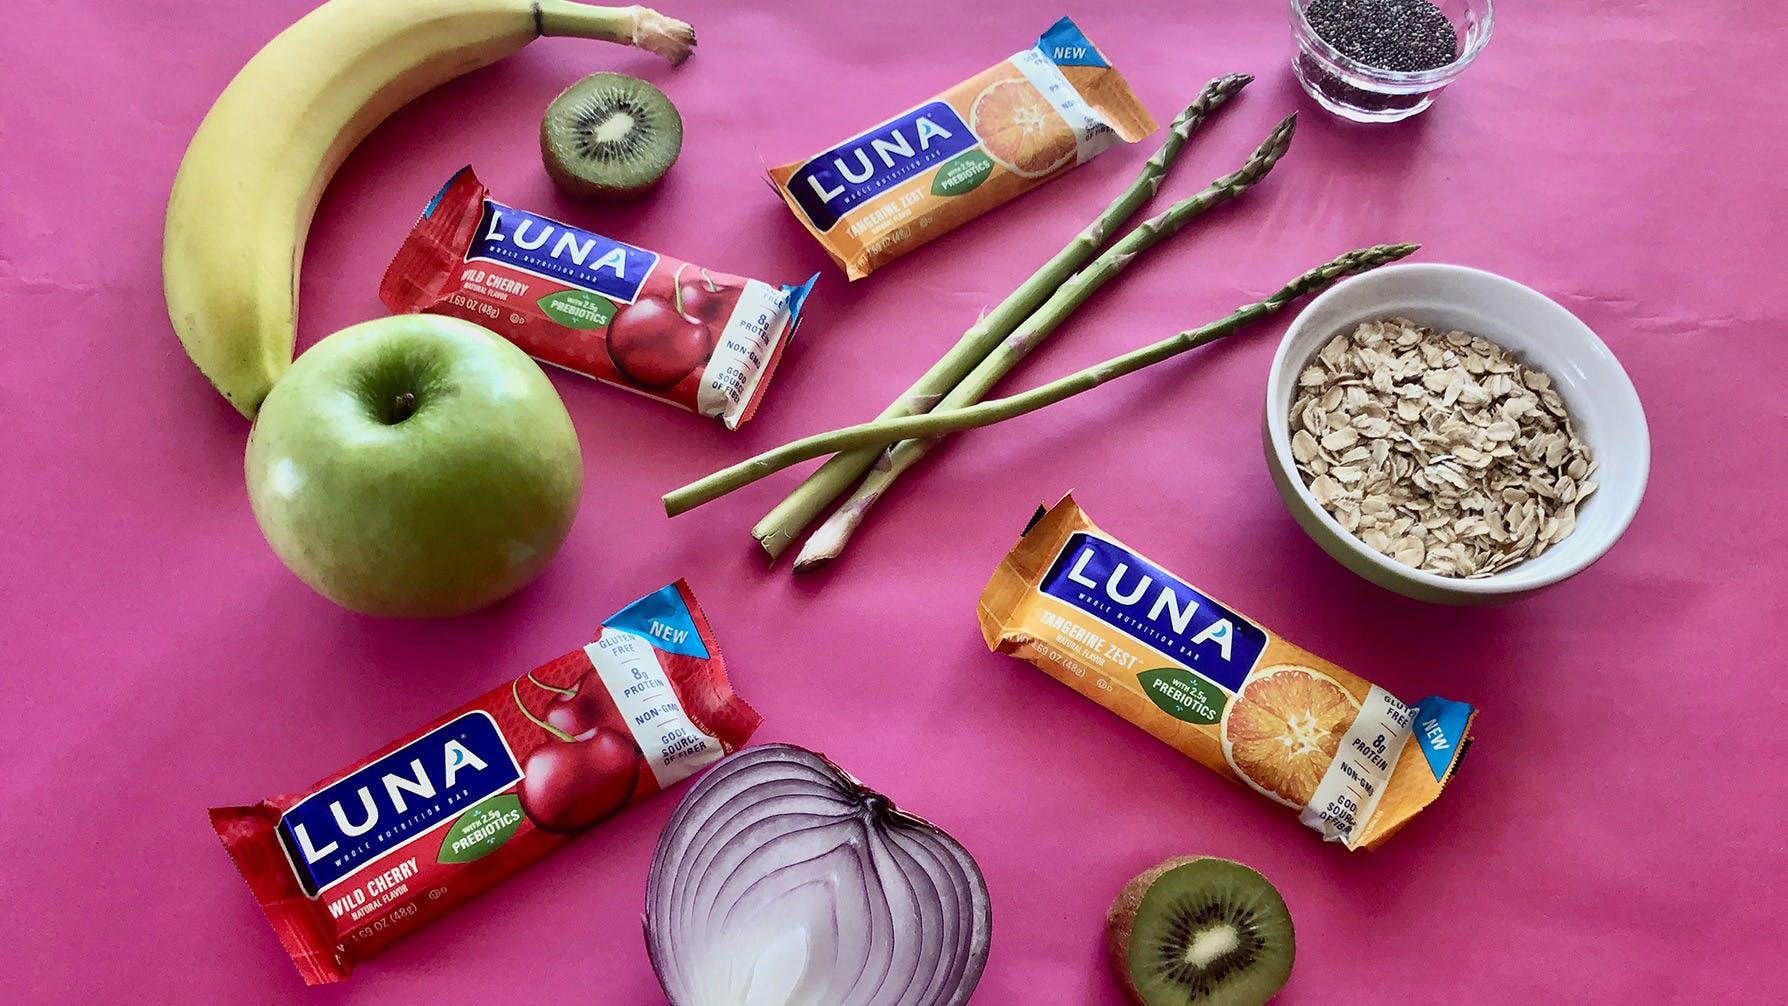 LUNA bars and prebiotic foods